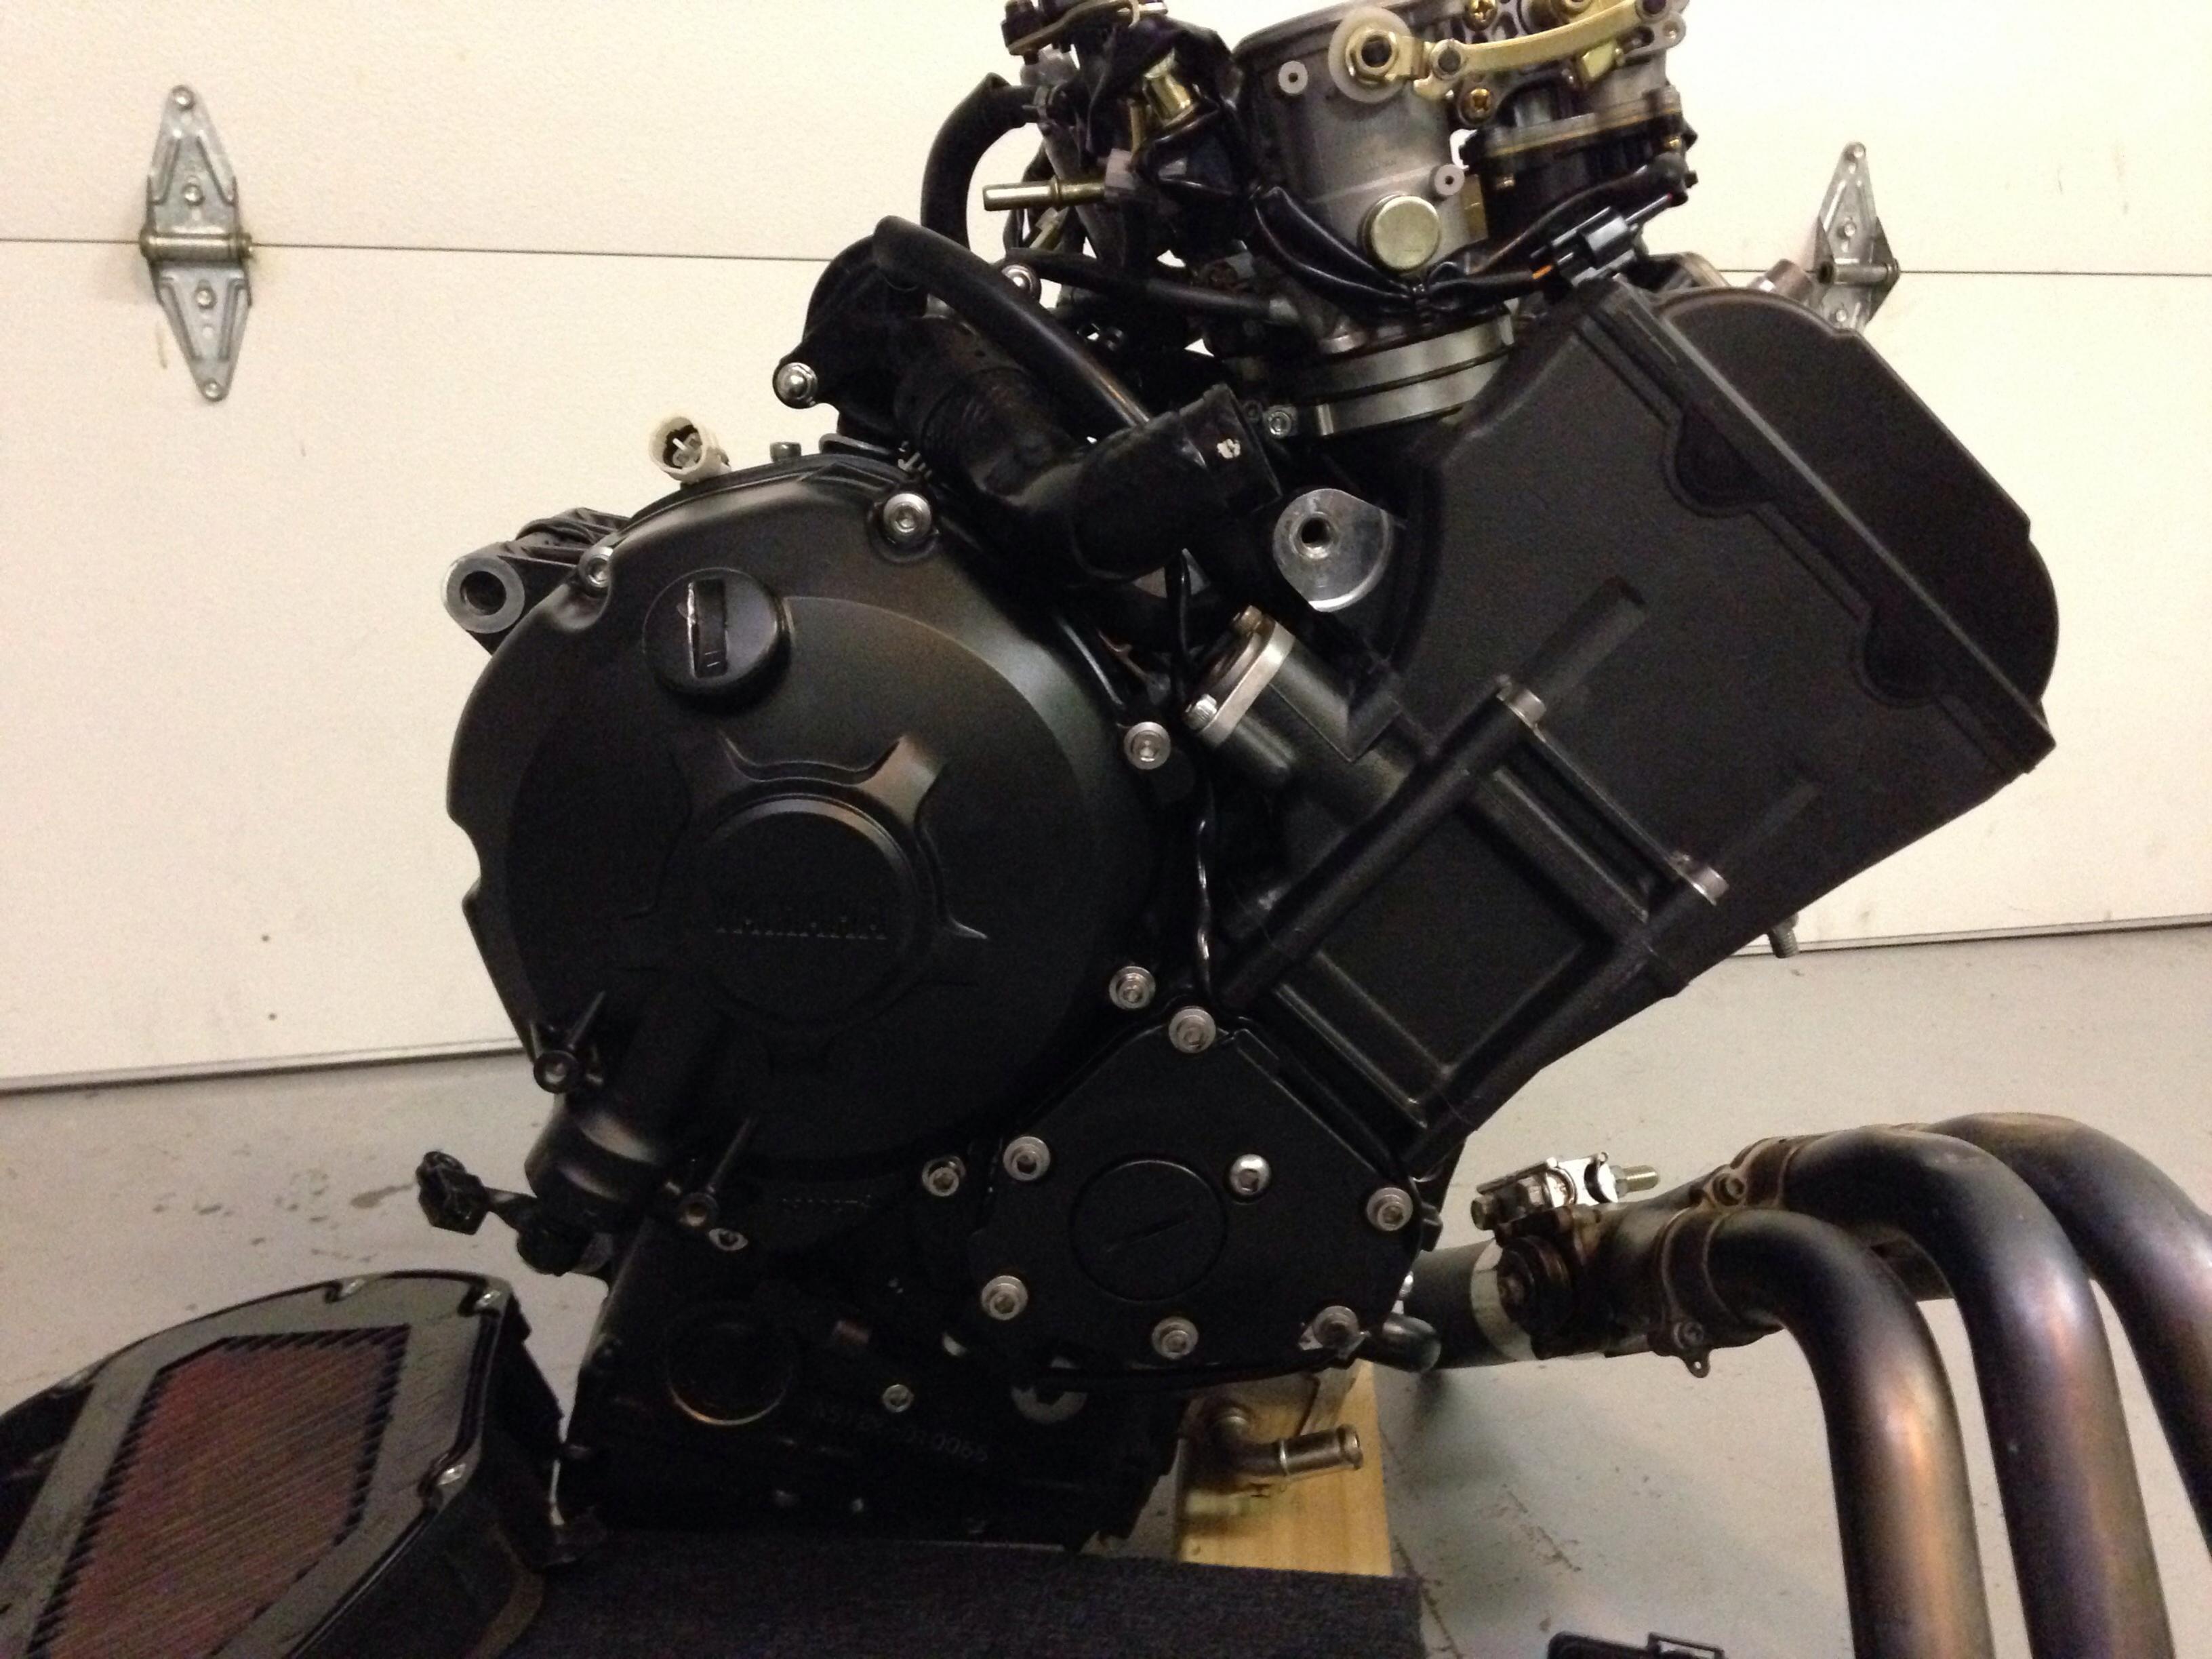 04-06 r1 yamaha motor/engine kit complete - Yamaha Rhino ...